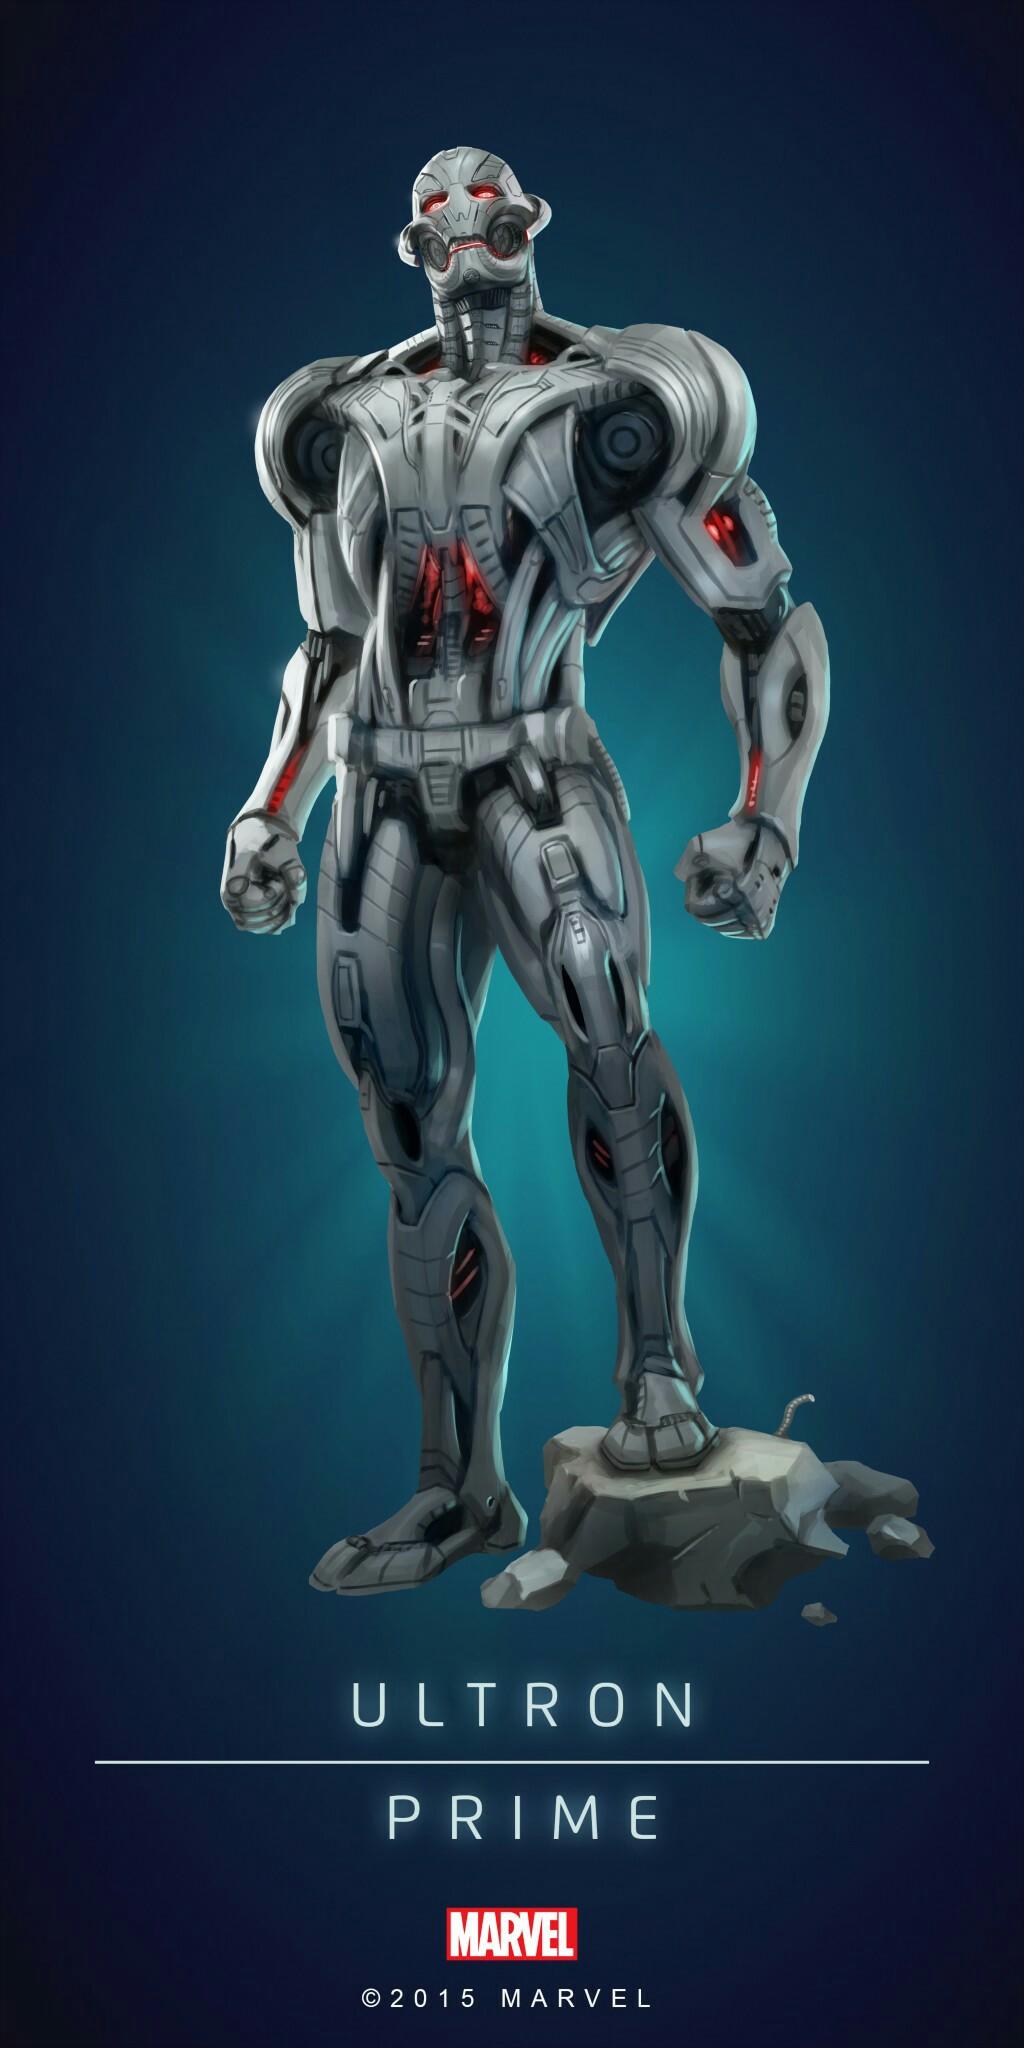 dccbaffdad-marvel-heroes-marvel-dc-wallpaper-wpc5803885